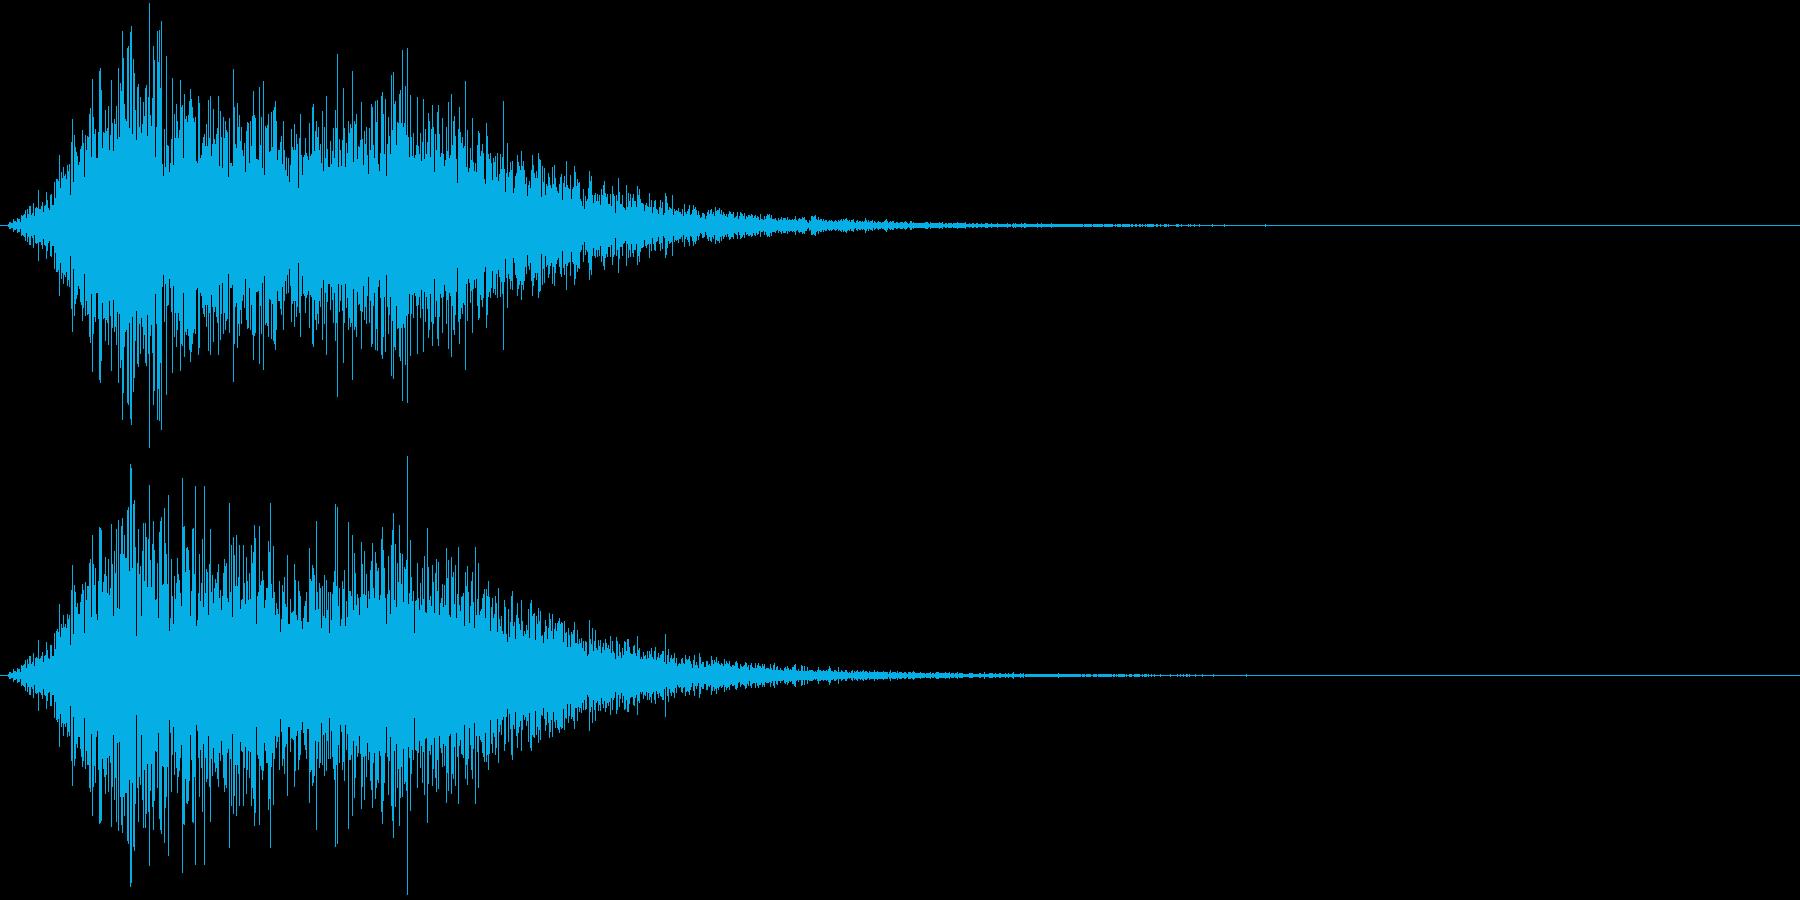 Battle 戦闘エフェクト音 5の再生済みの波形